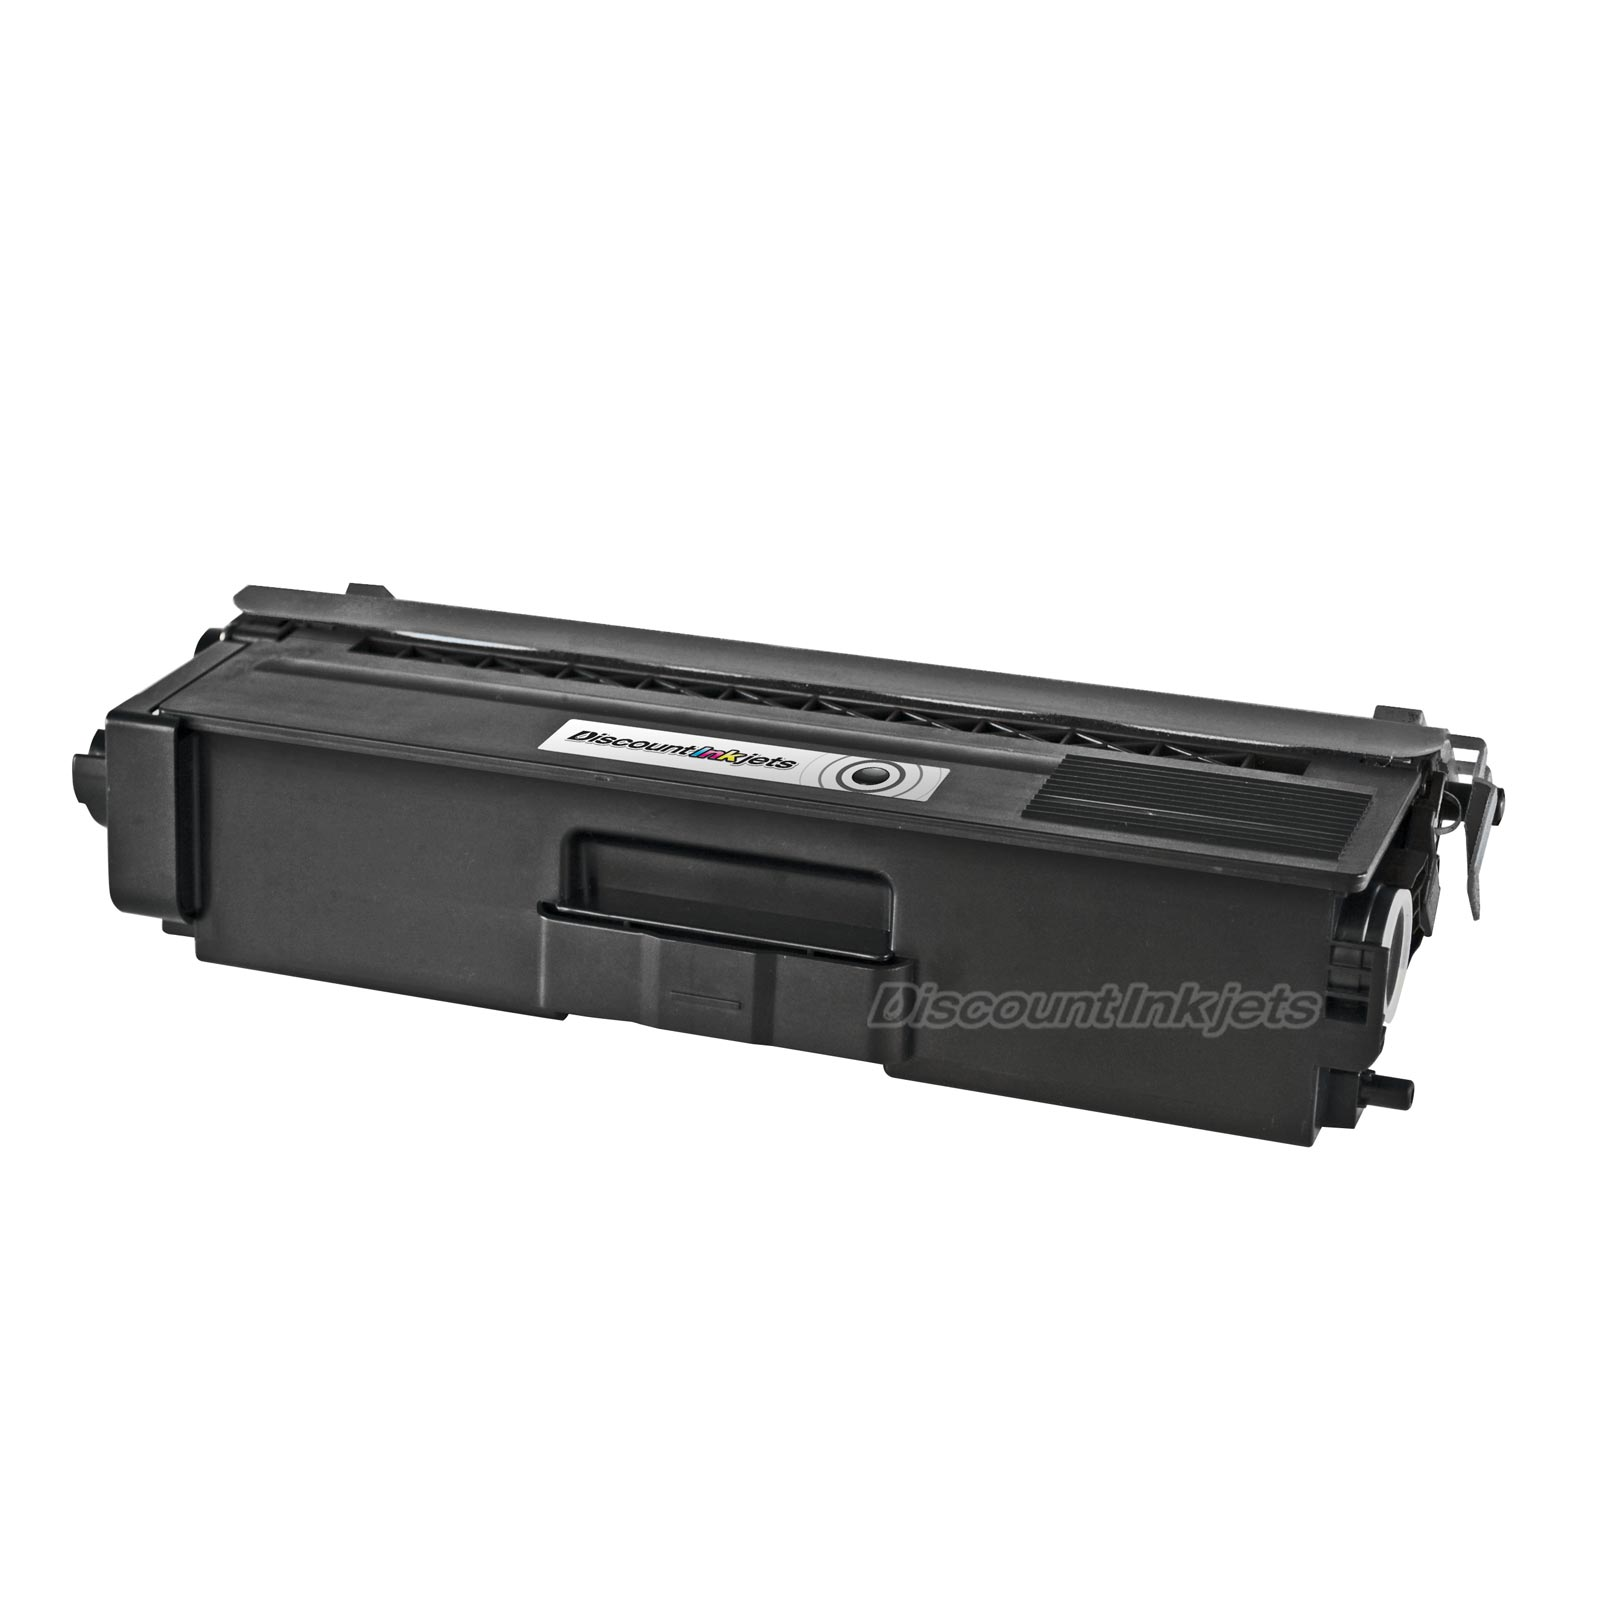 2 x TN-315BK TN315 Black Toner Cartridge For Brother HL-4150CDN HL-4570CDW